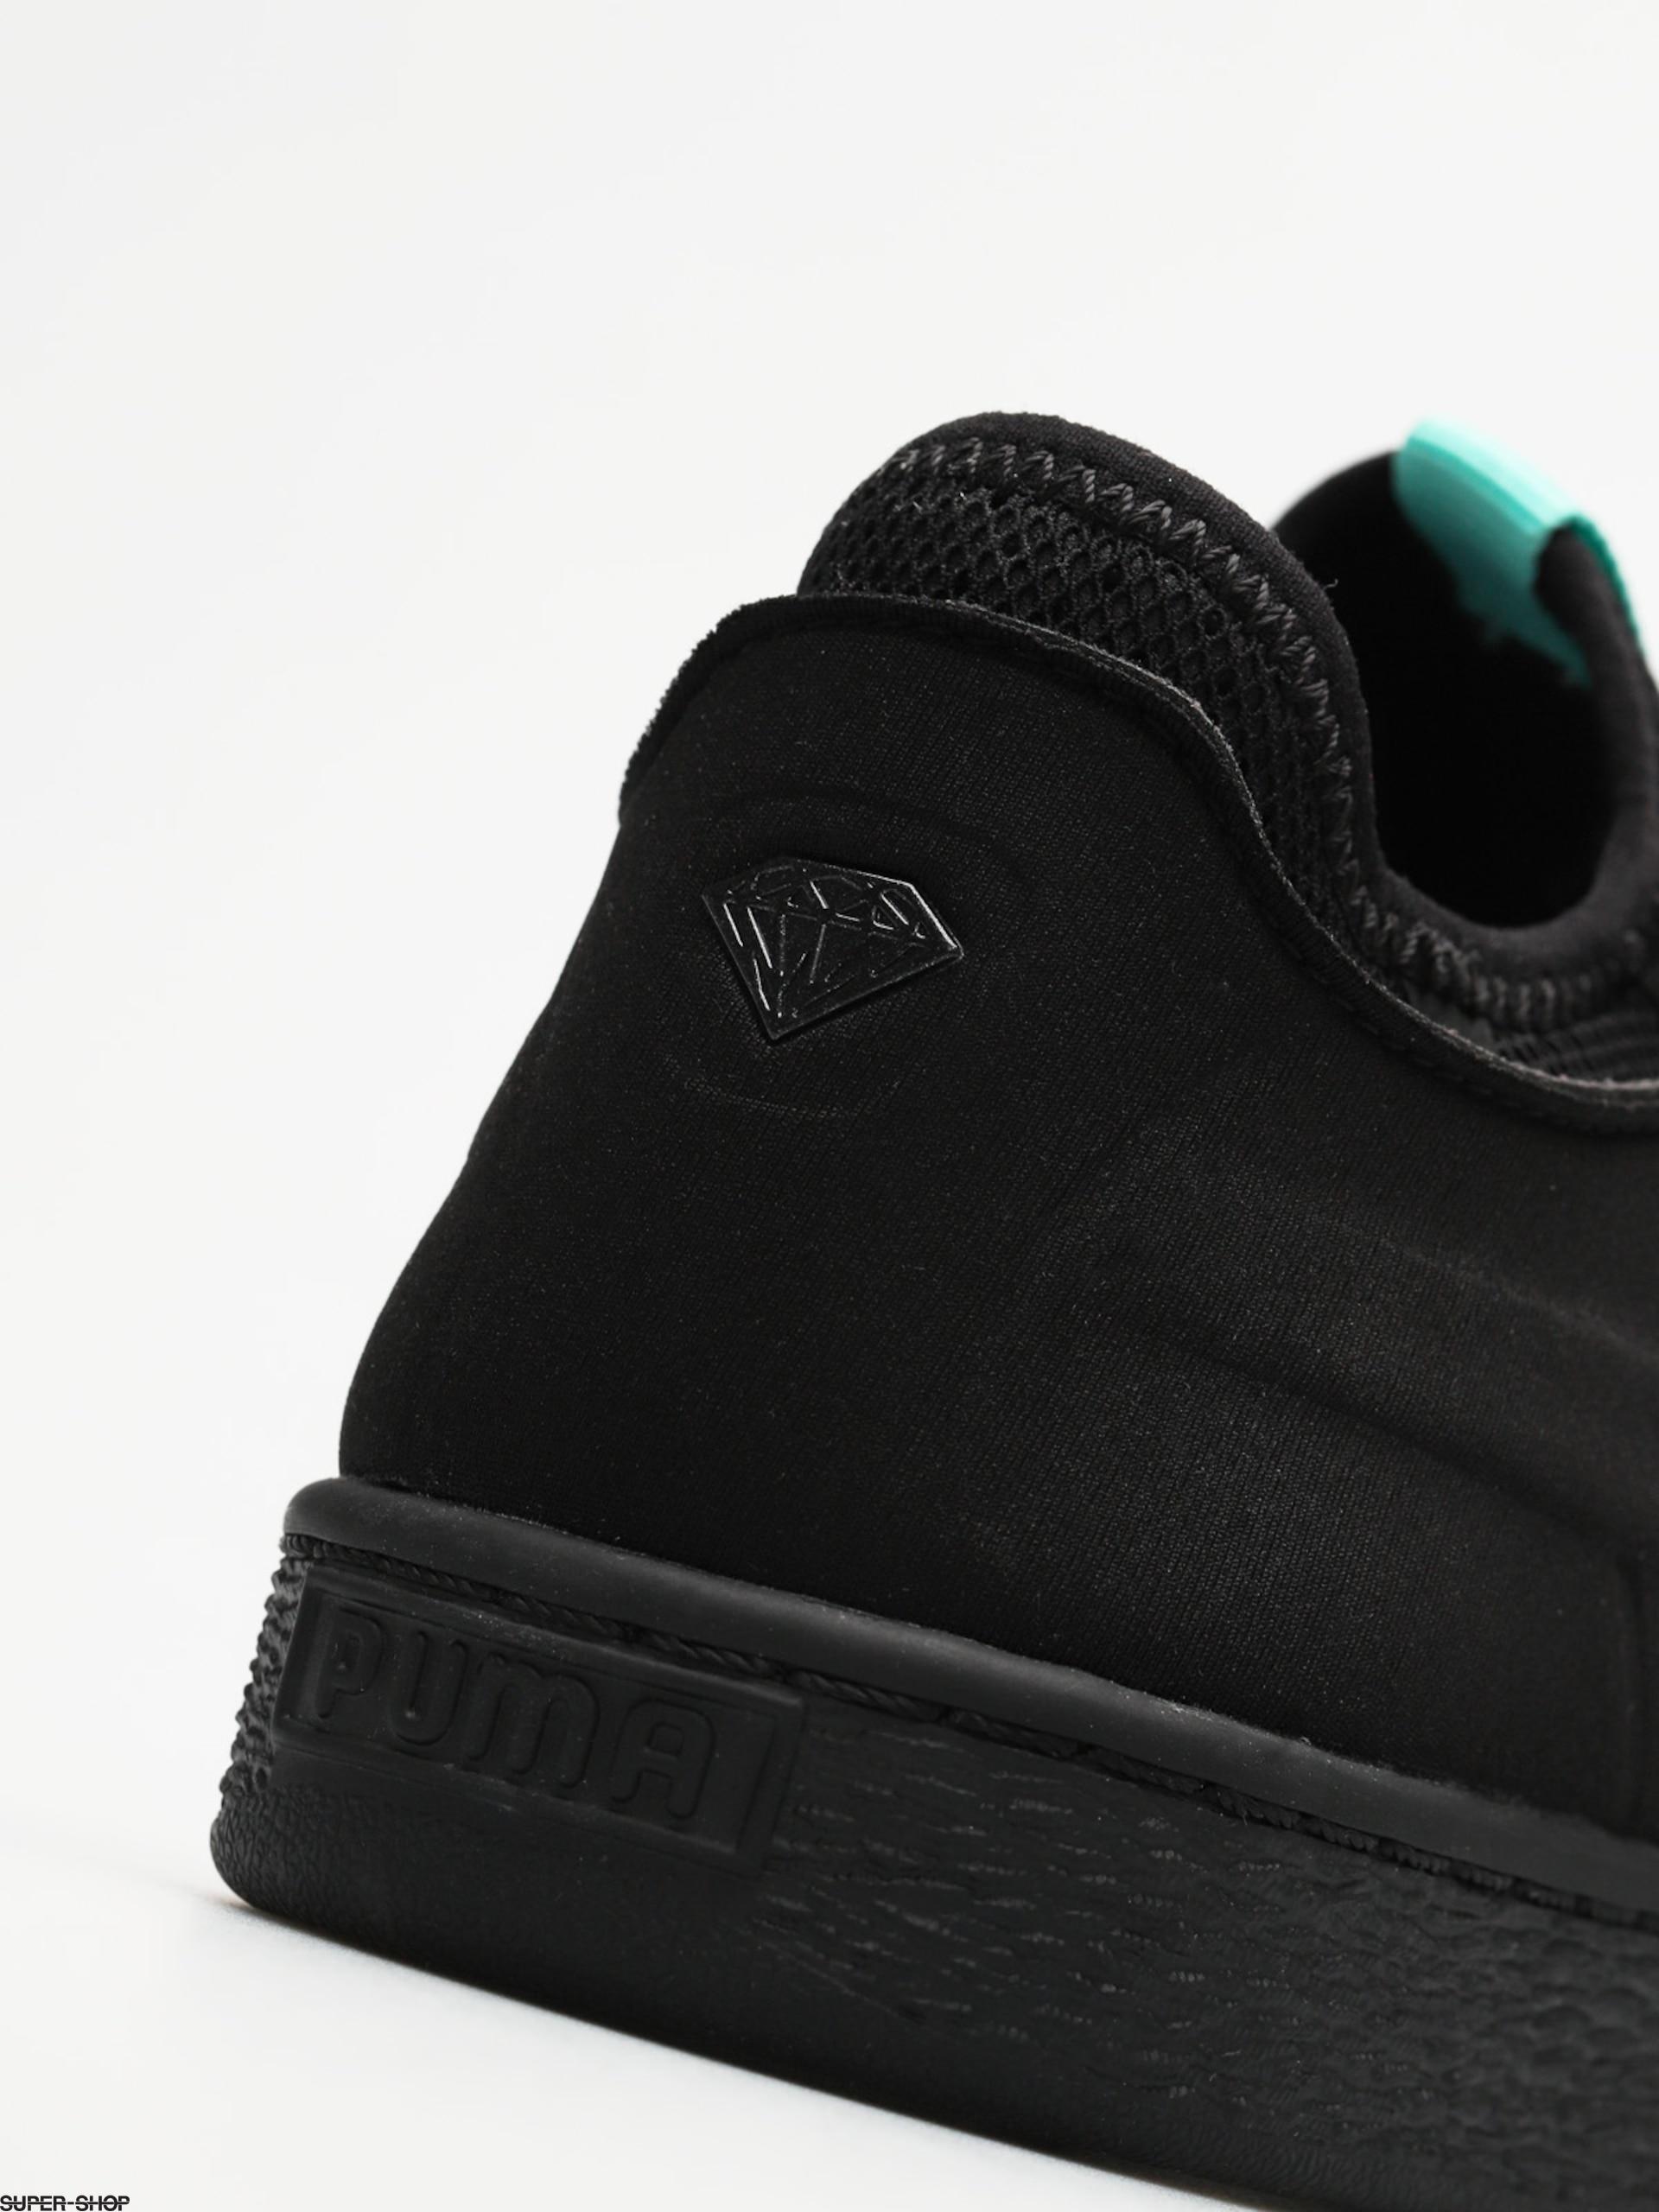 separation shoes 44191 e4a24 Puma Shoes Basket Sock Lo Diamond (puma black)